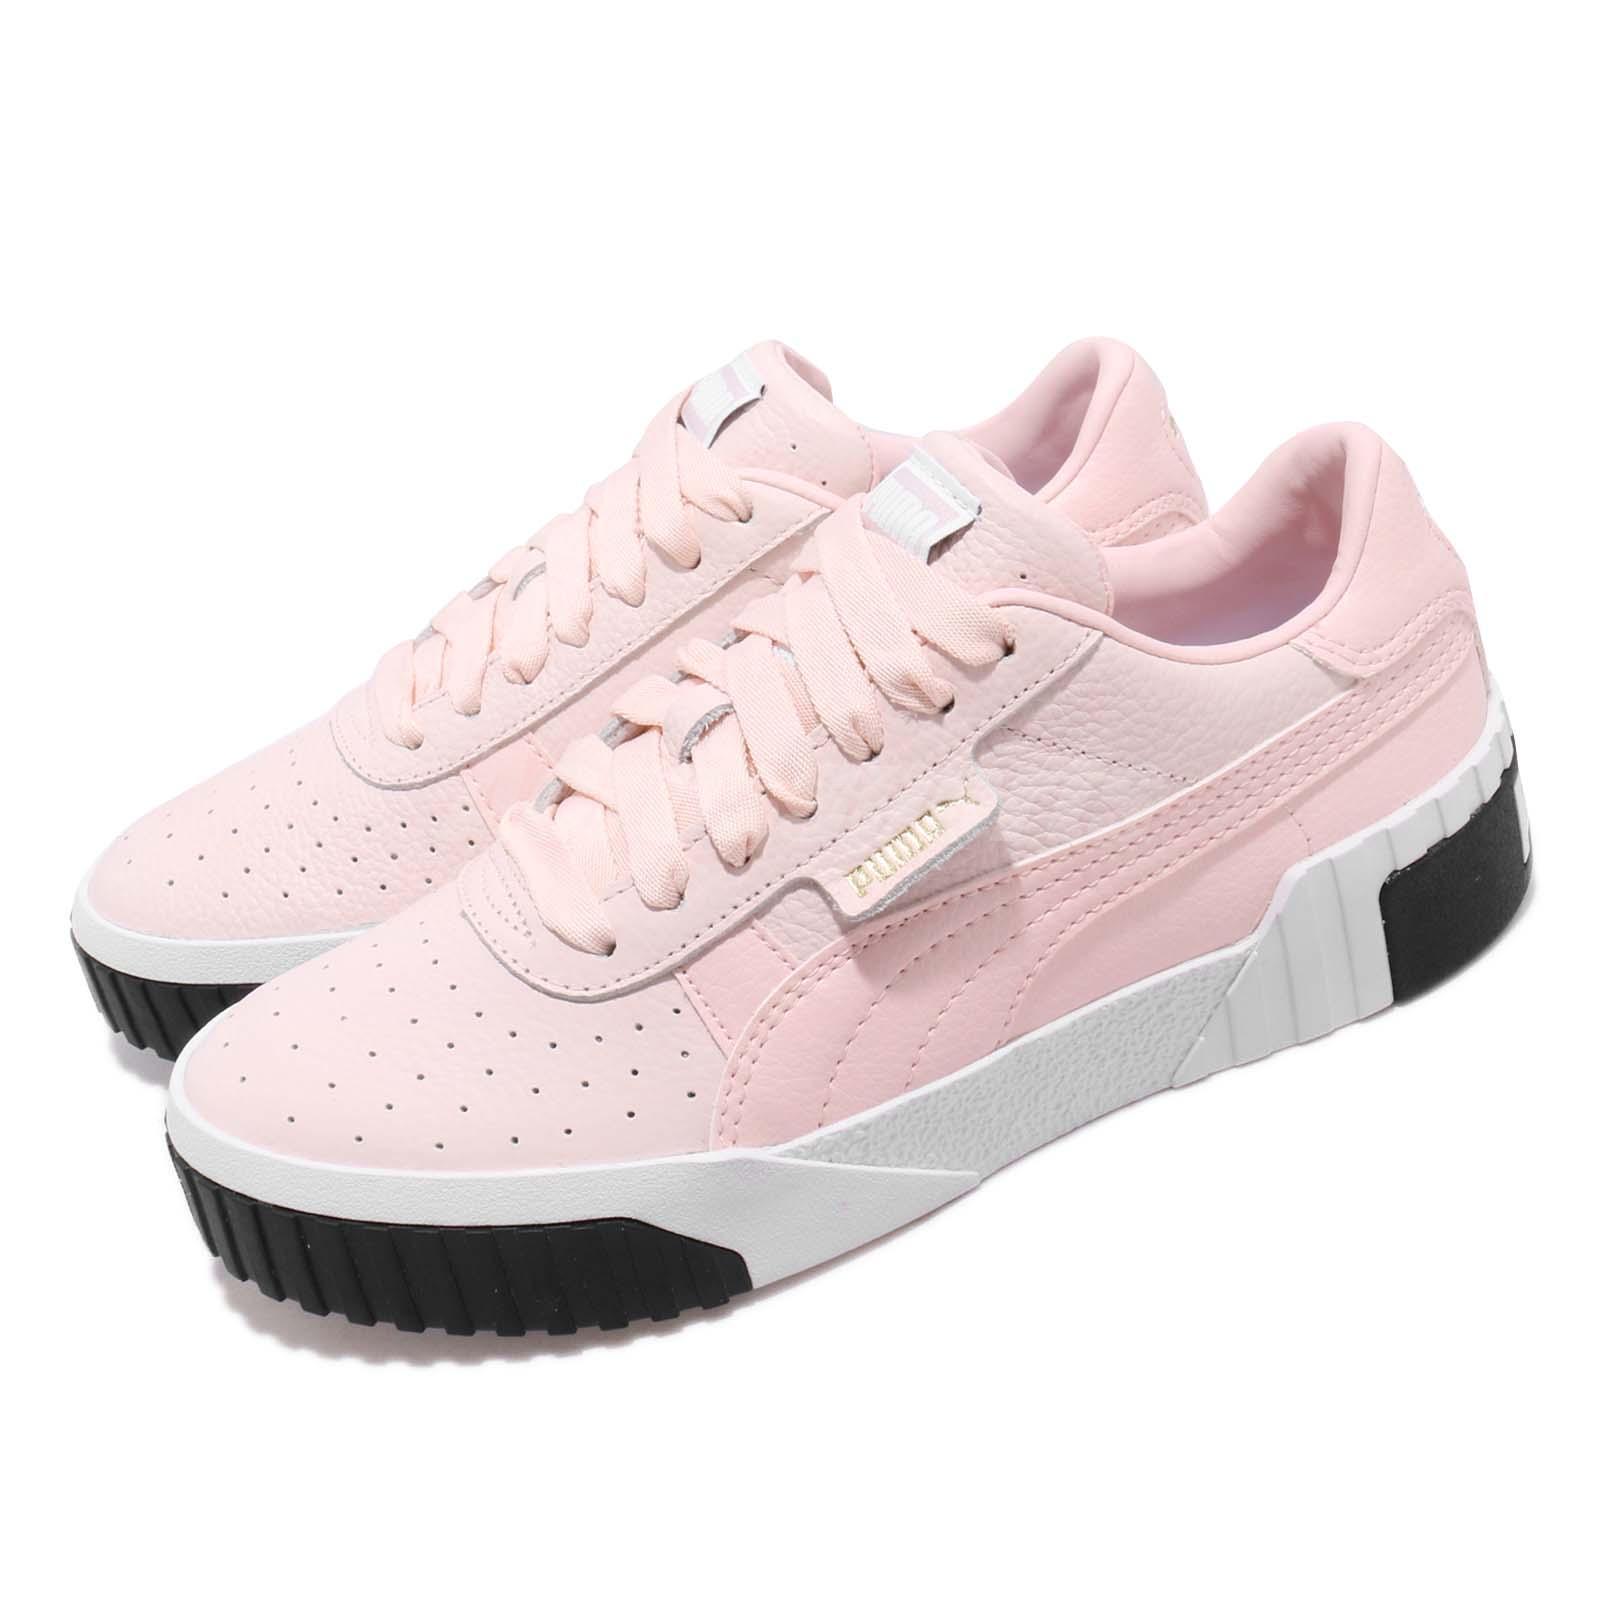 Puma Cali Wns Pink Dogwood White Women Fashion shoes Sneakers 369155-06